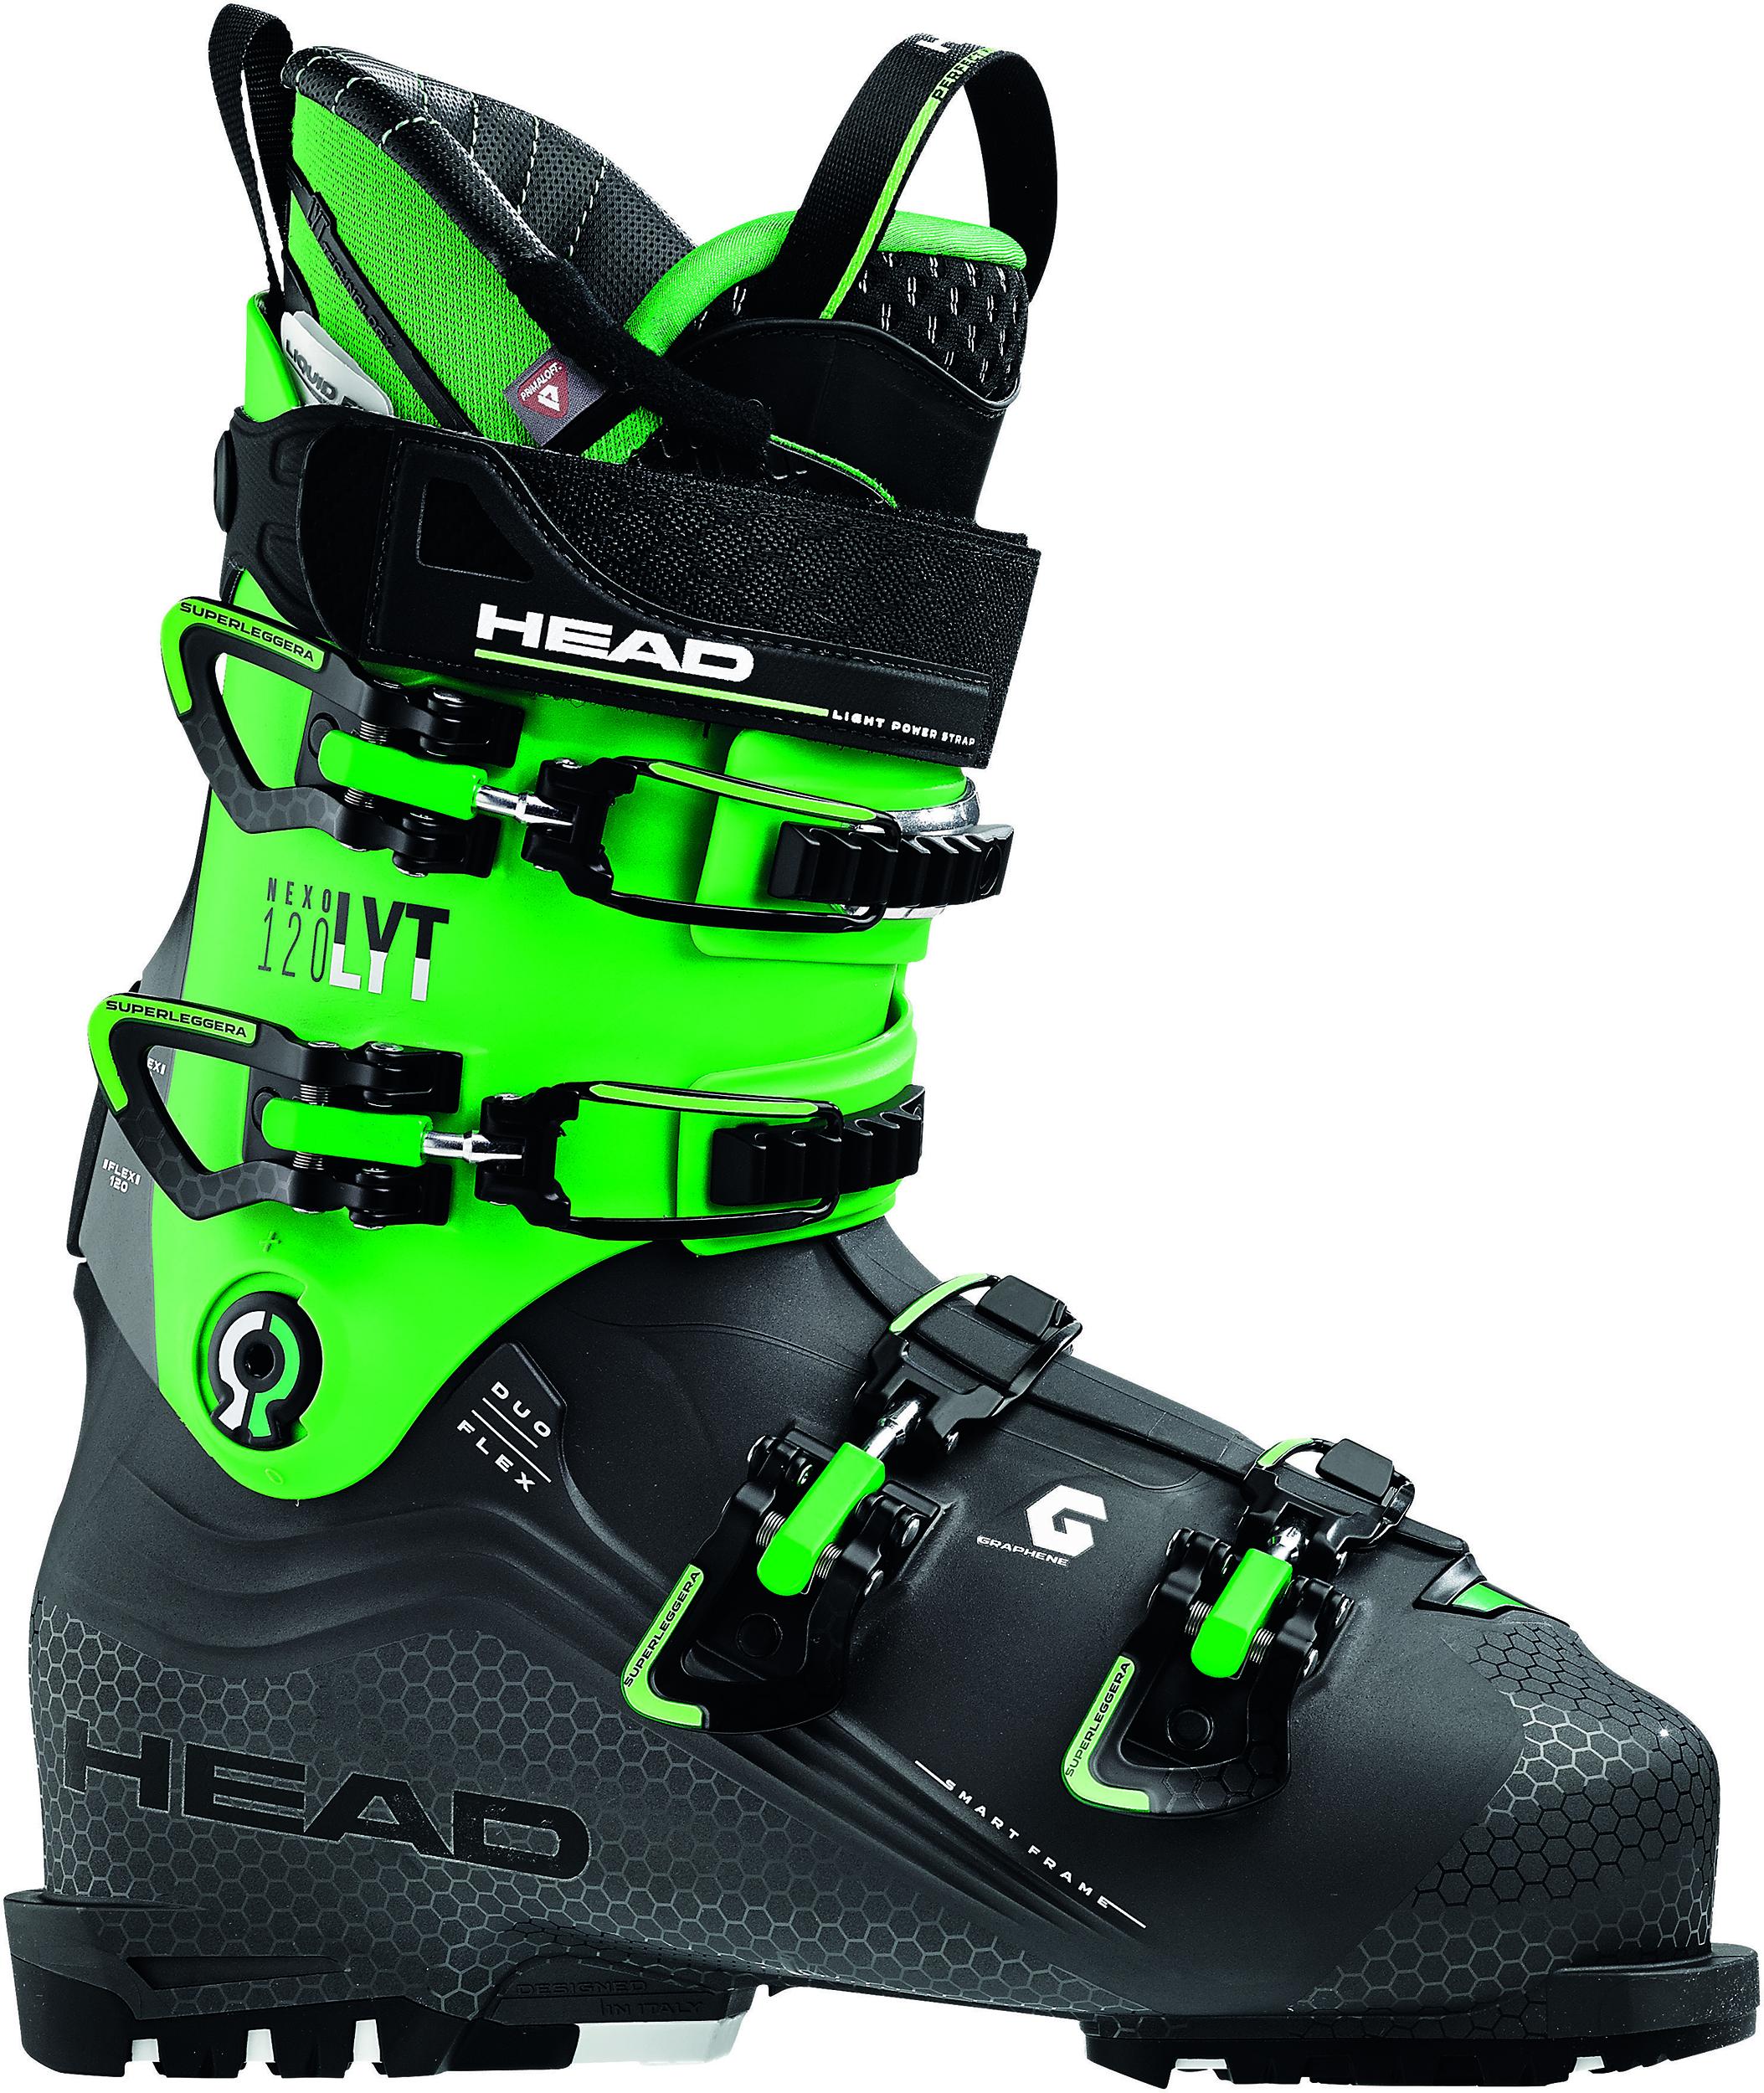 1b7eba8f91 Downhill ski boots and accessories